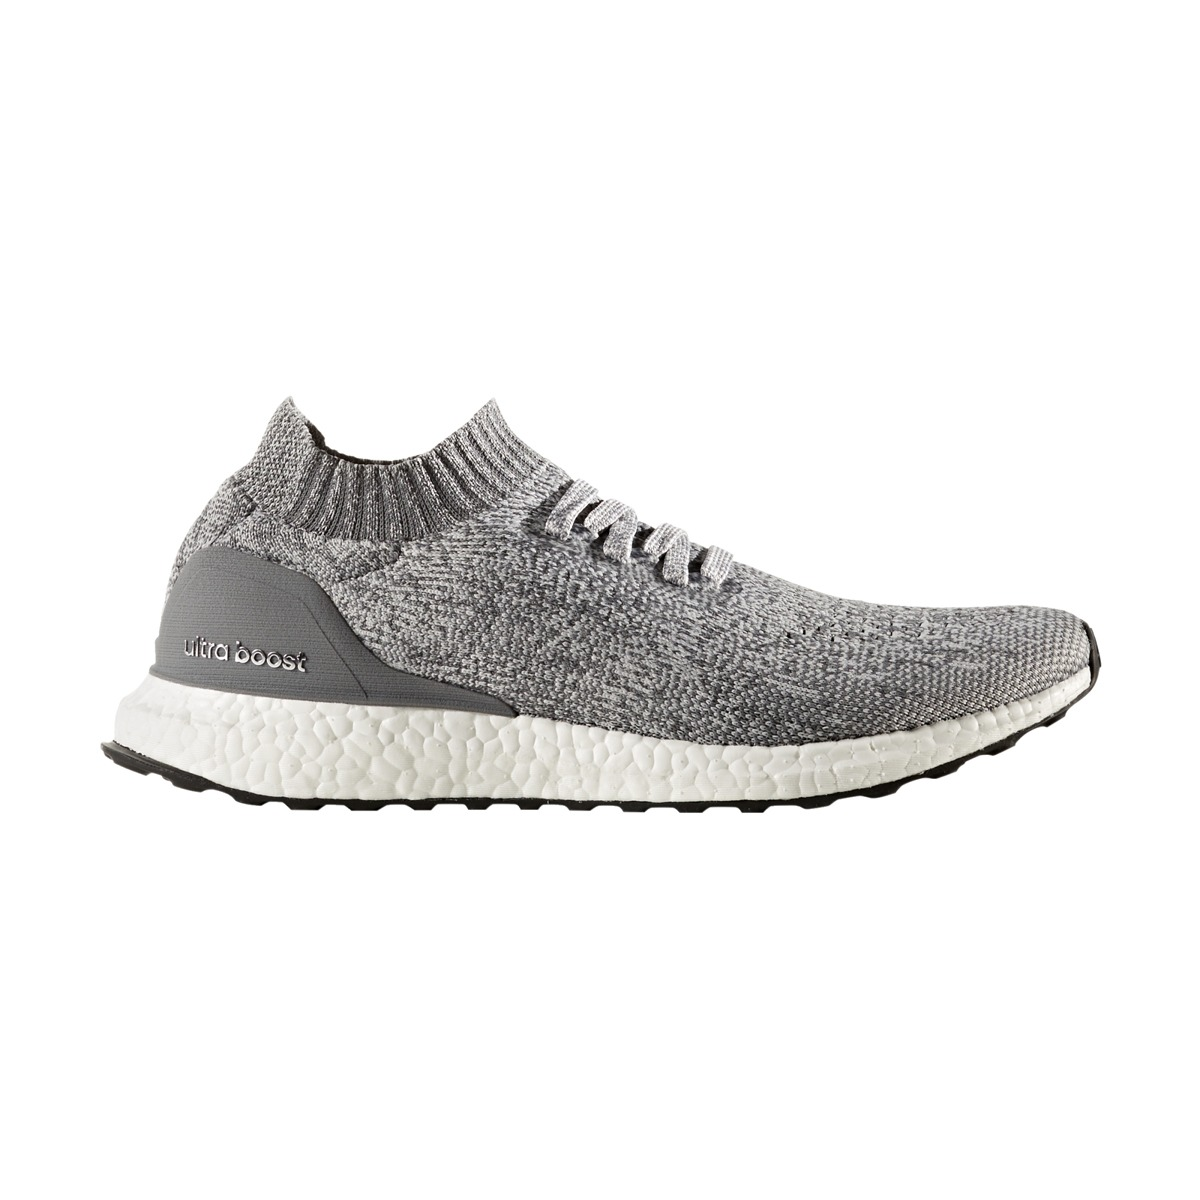 zapatillas adidas running ultraboost uncaged hombre gr go. Cargando zoom. 9542ef886d9